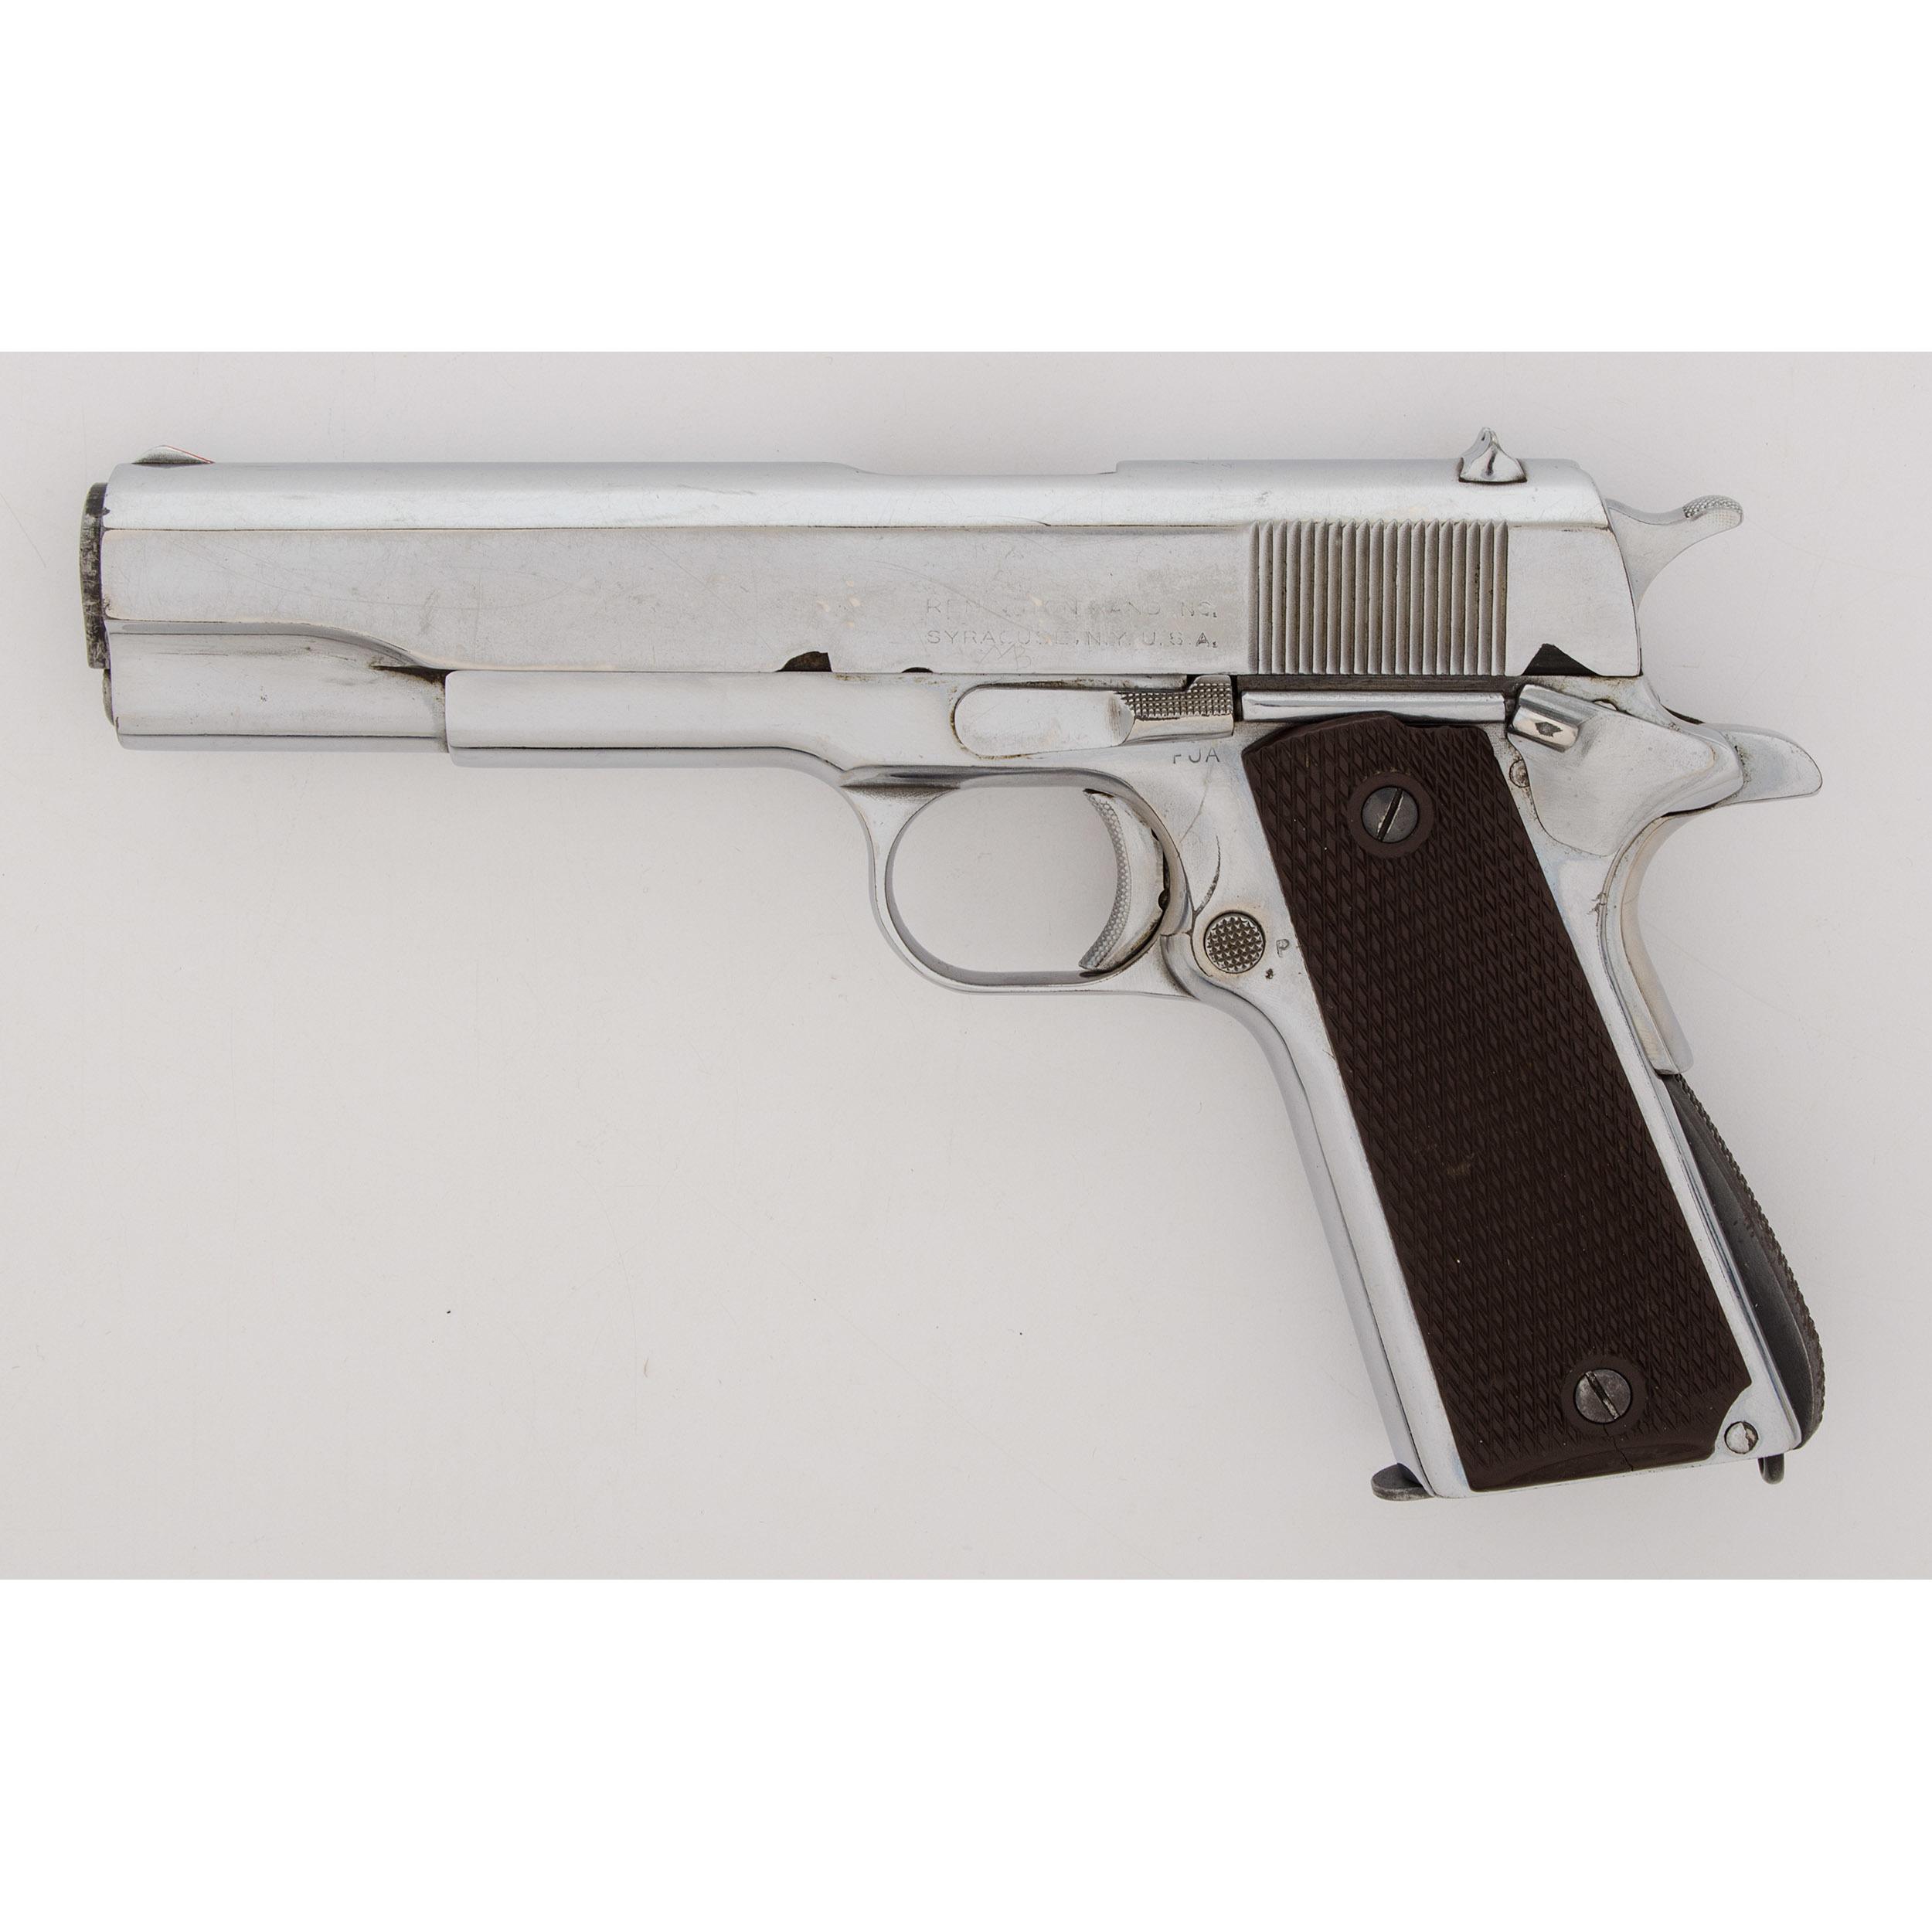 Remington Rand Model 1911 | Cowan's Auction House: The